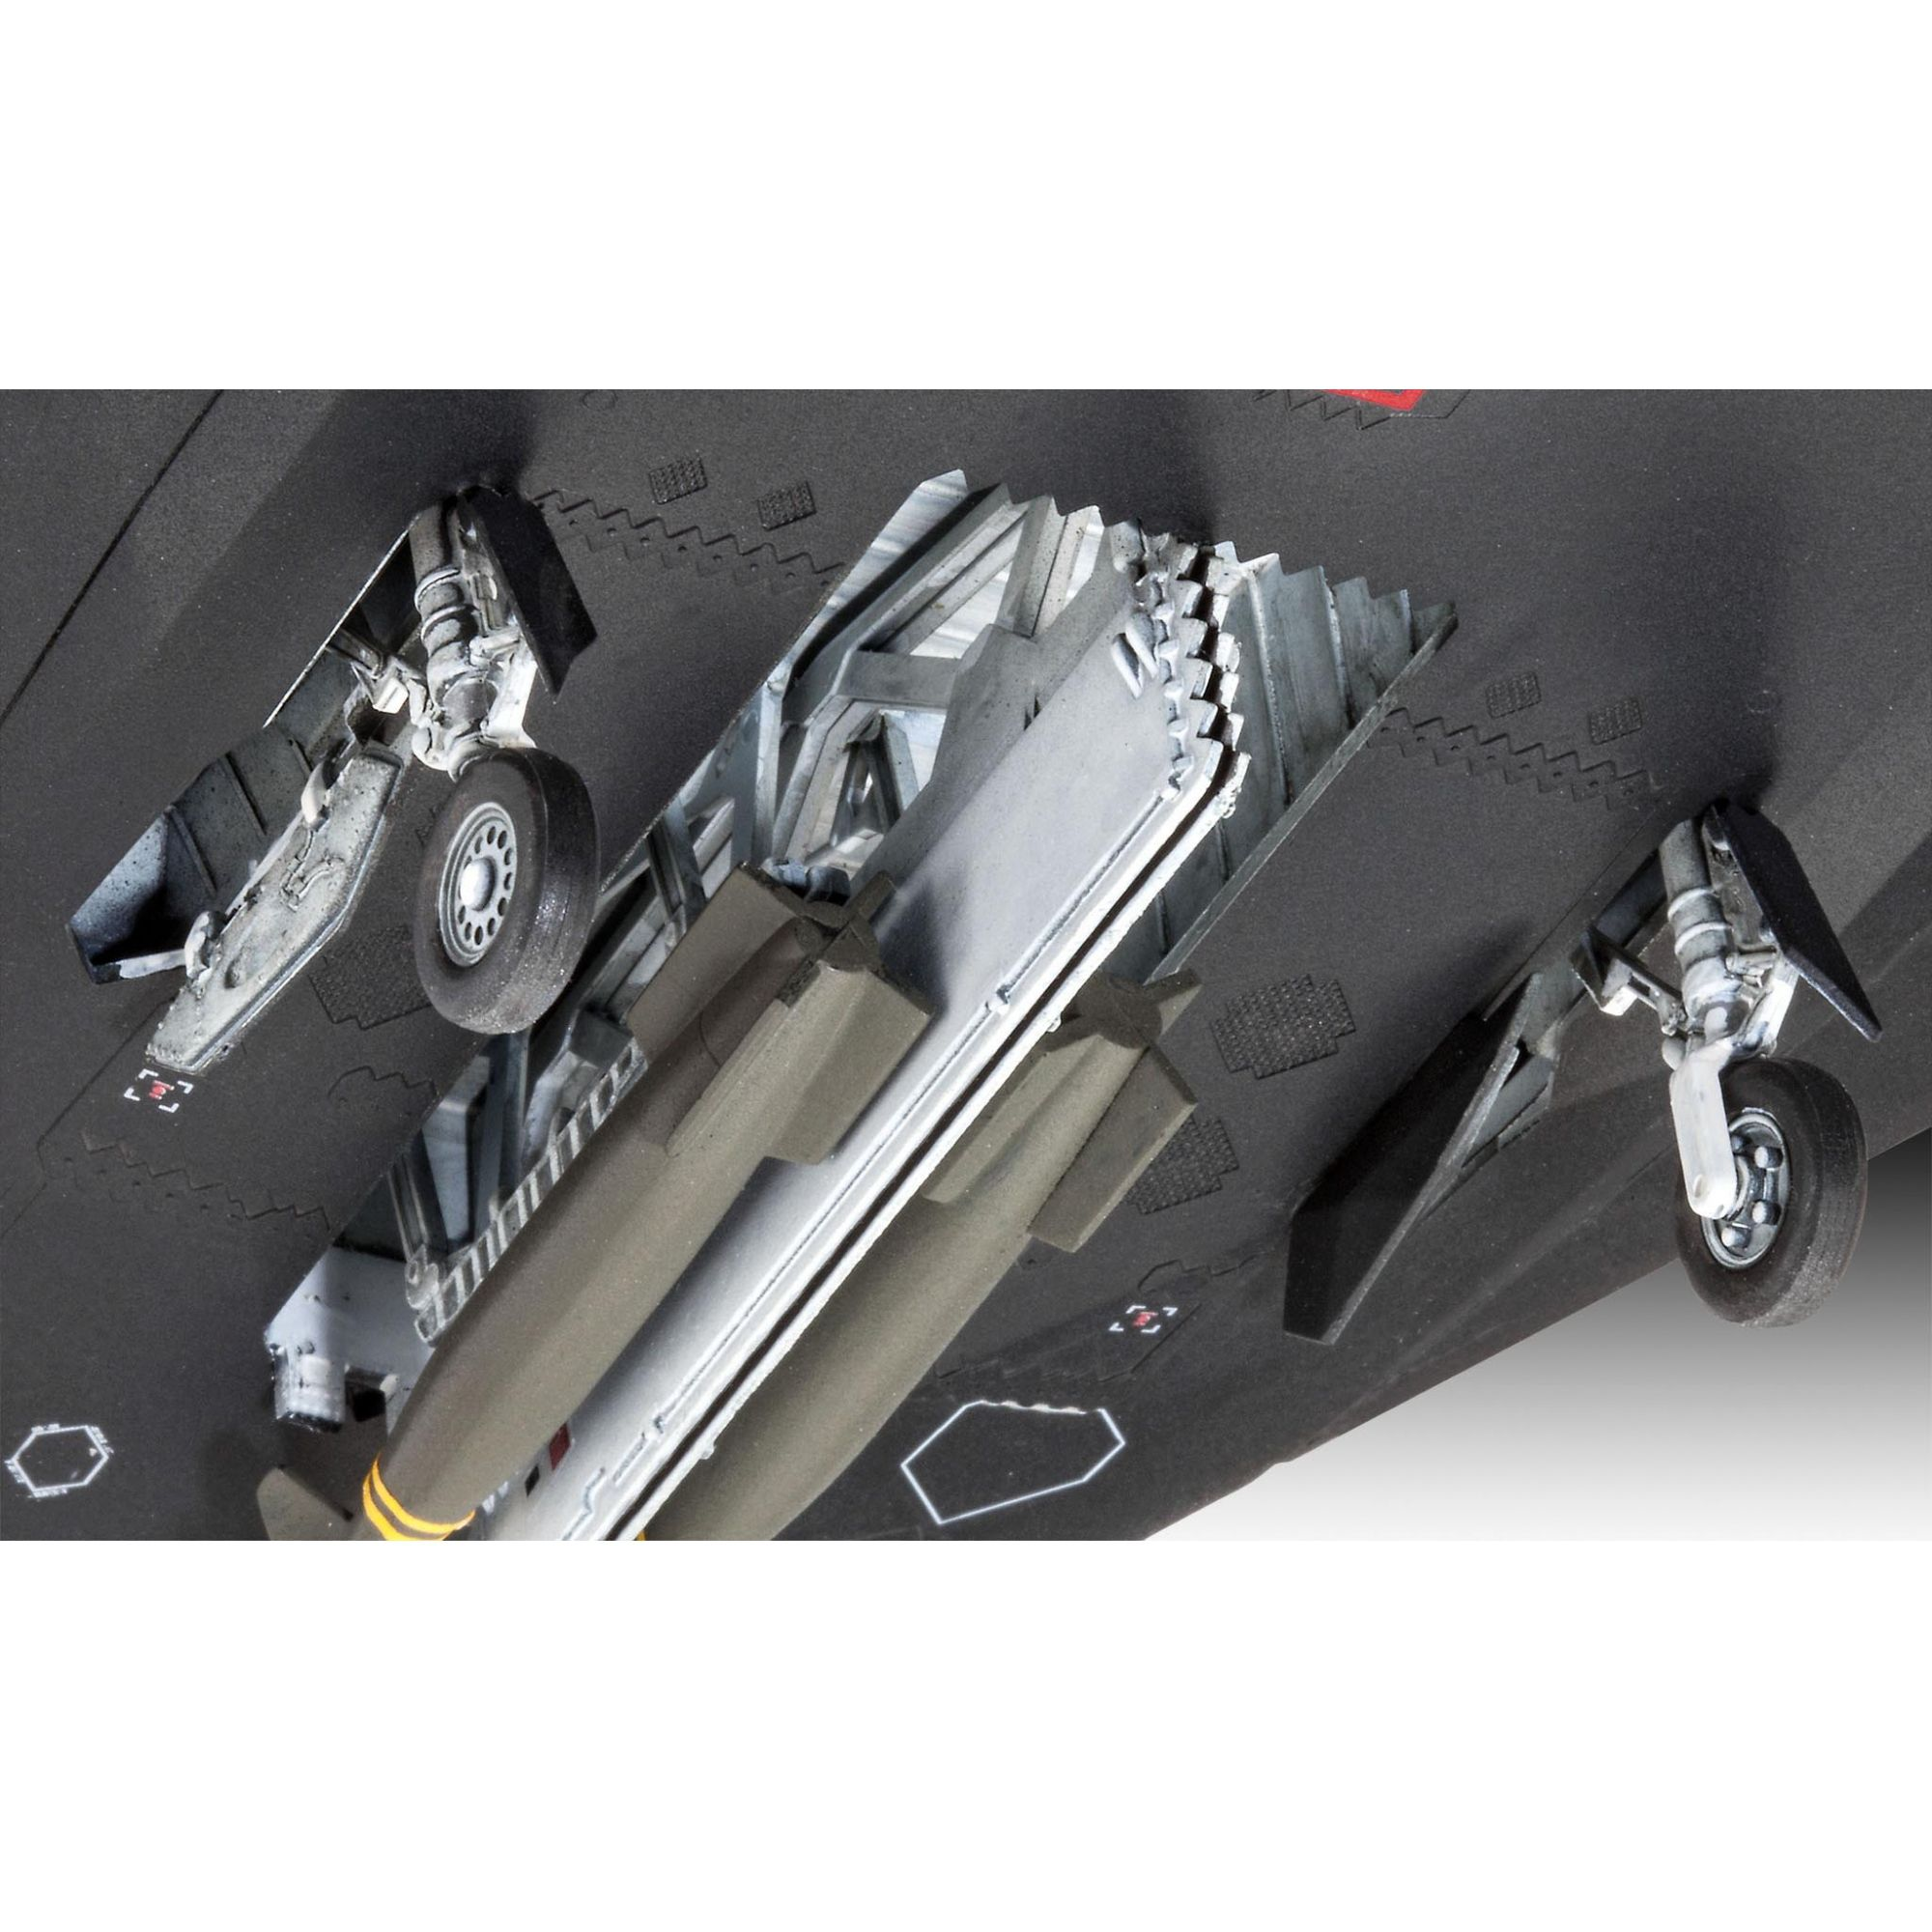 Lockheed Martin F-117A Nighthawk - 1/72 - Revell 03899  - BLIMPS COMÉRCIO ELETRÔNICO